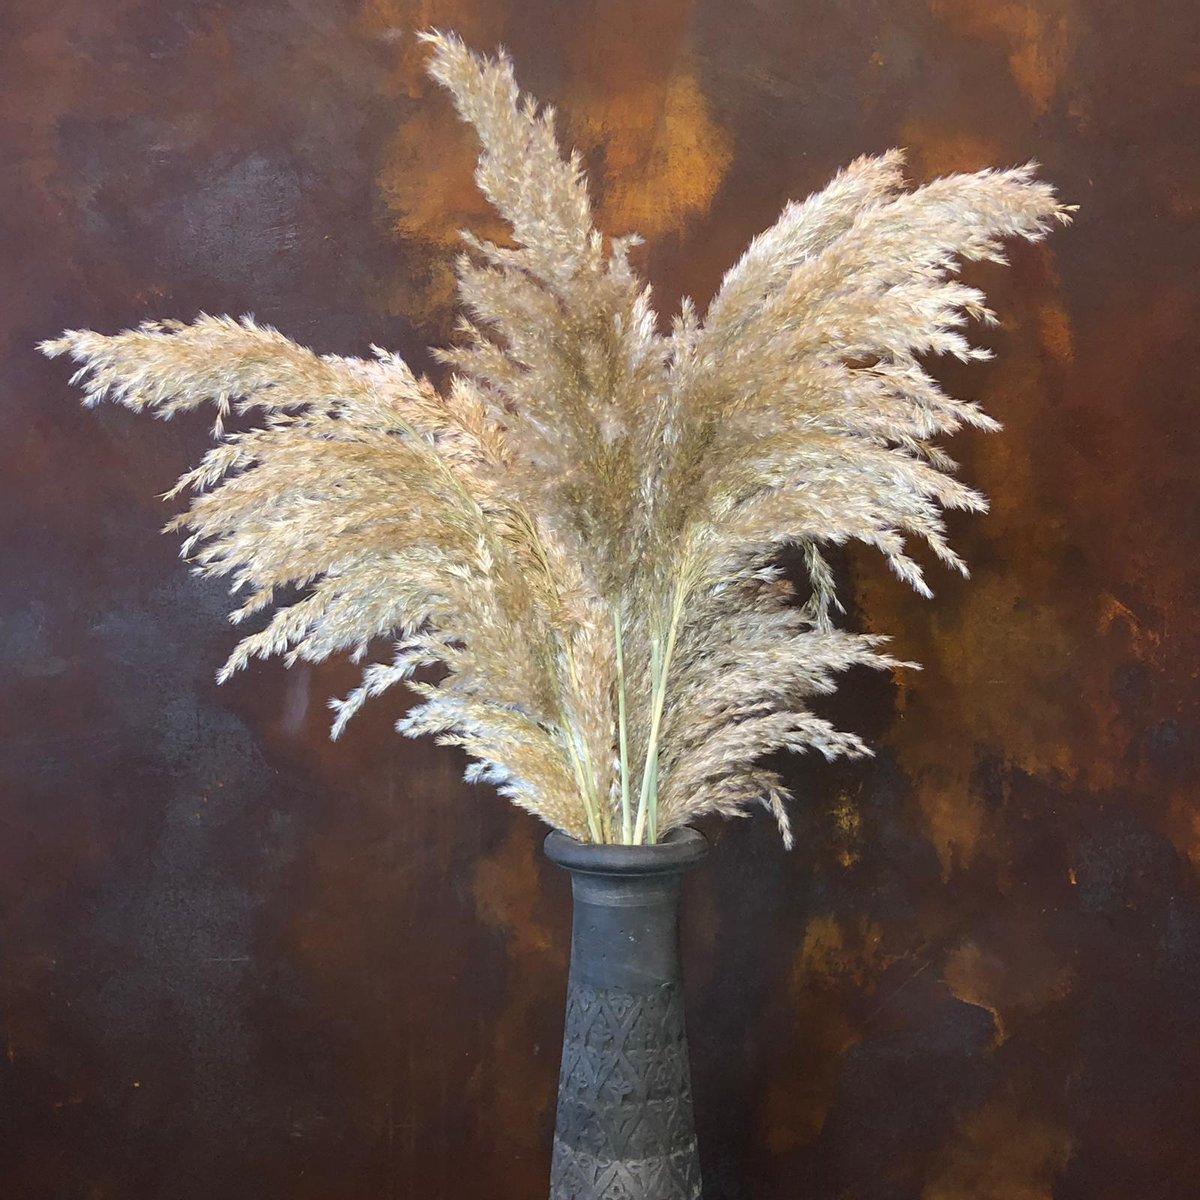 Rietpluimen   Pampas pluimen   Pampas gras   10 stuks   75 cm   BloomitUp